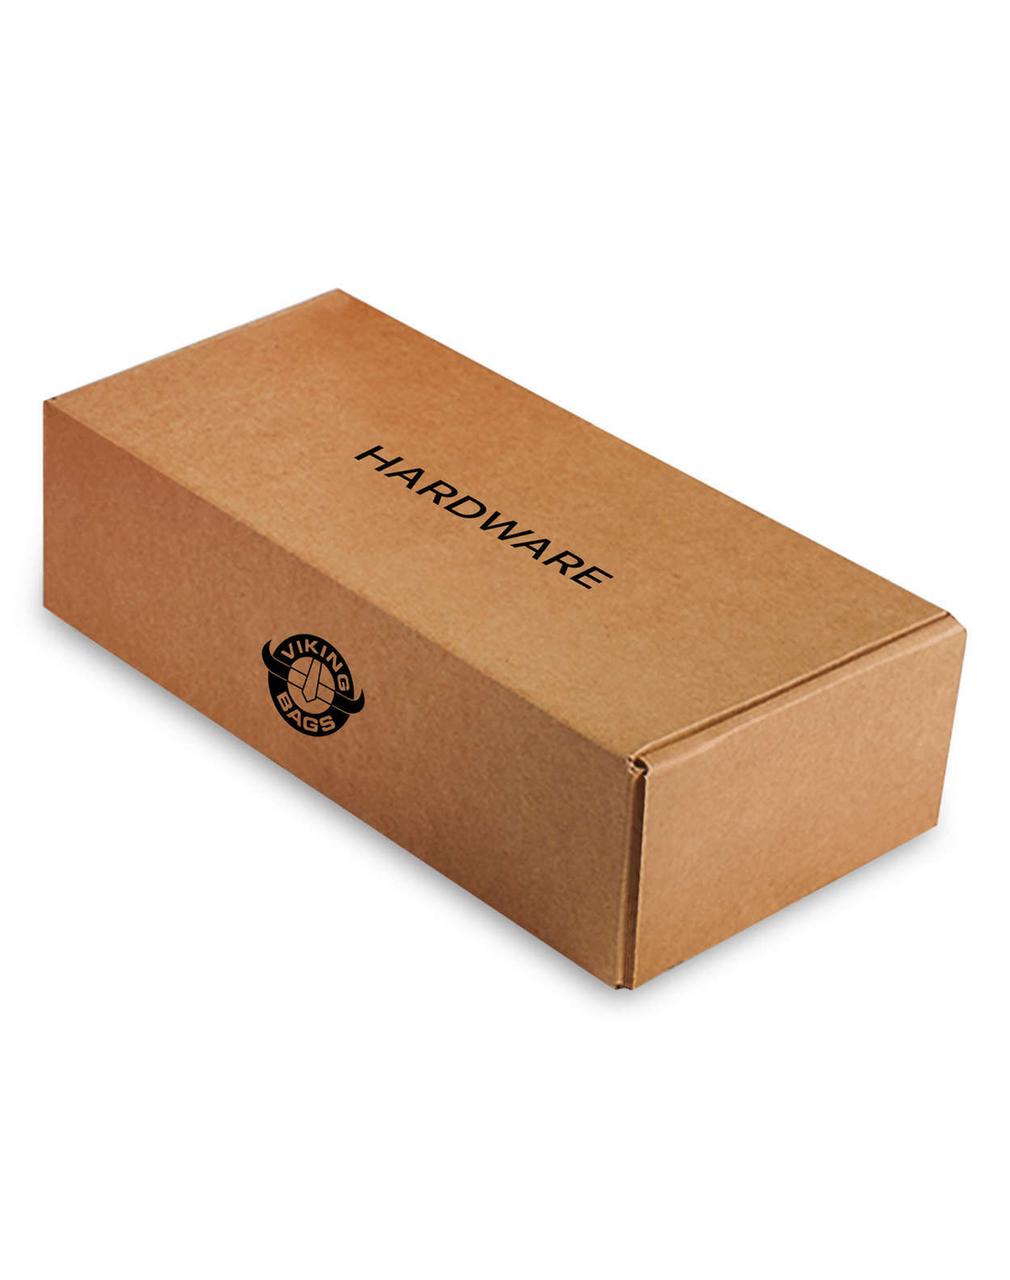 Triumph Rocket III Roadster Slanted Studded Large Motorcycle Saddlebags Box